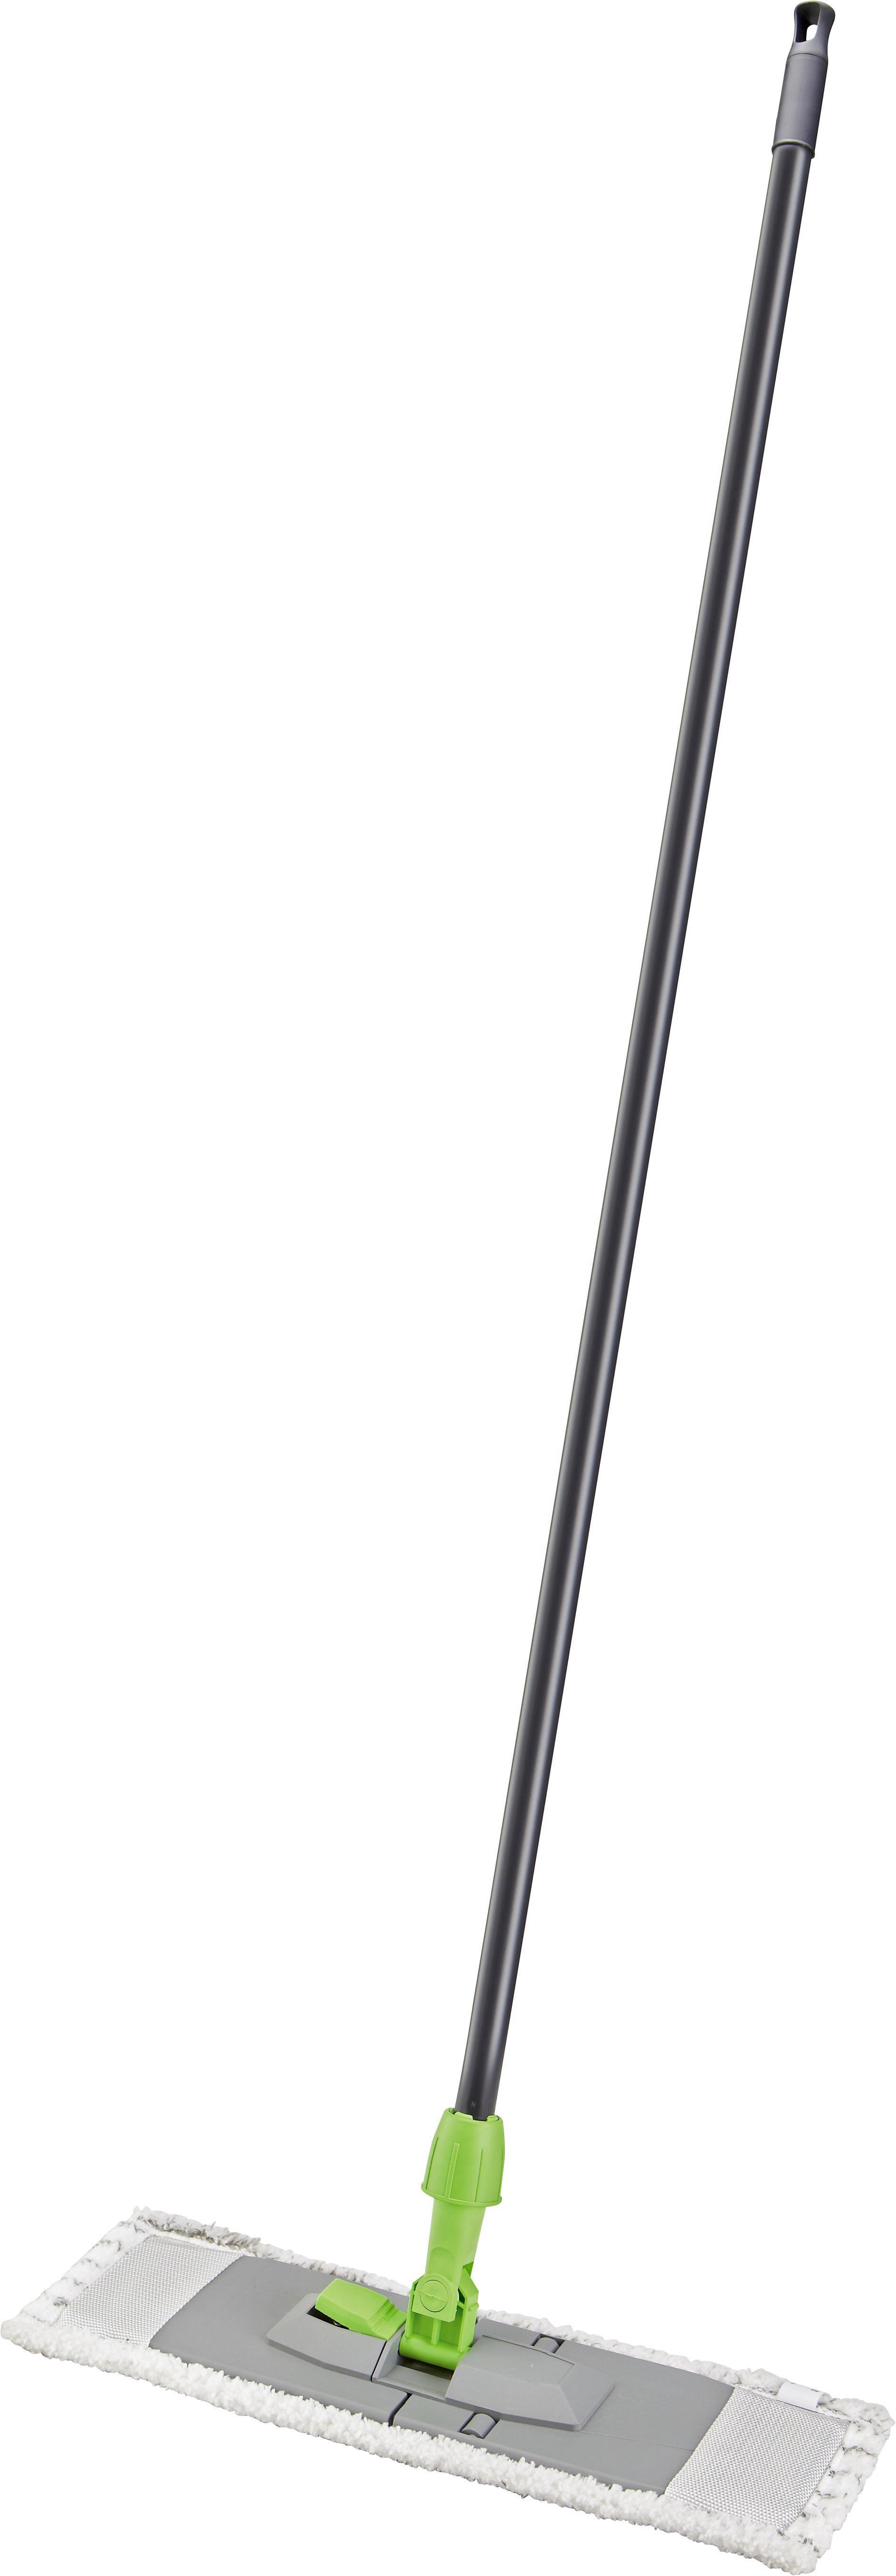 Čistilec Tal 82242 - zelena/antracit, kovina/umetna masa (138/15/44cm) - MÖMAX modern living